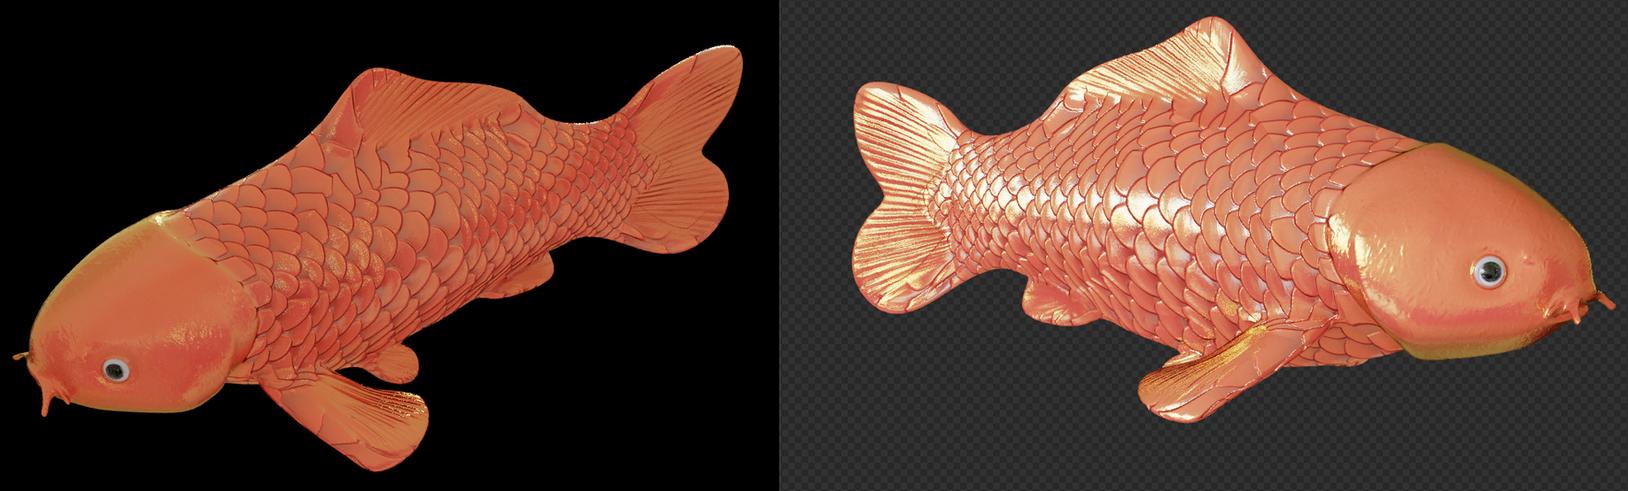 Textured fish by vasilnatalie